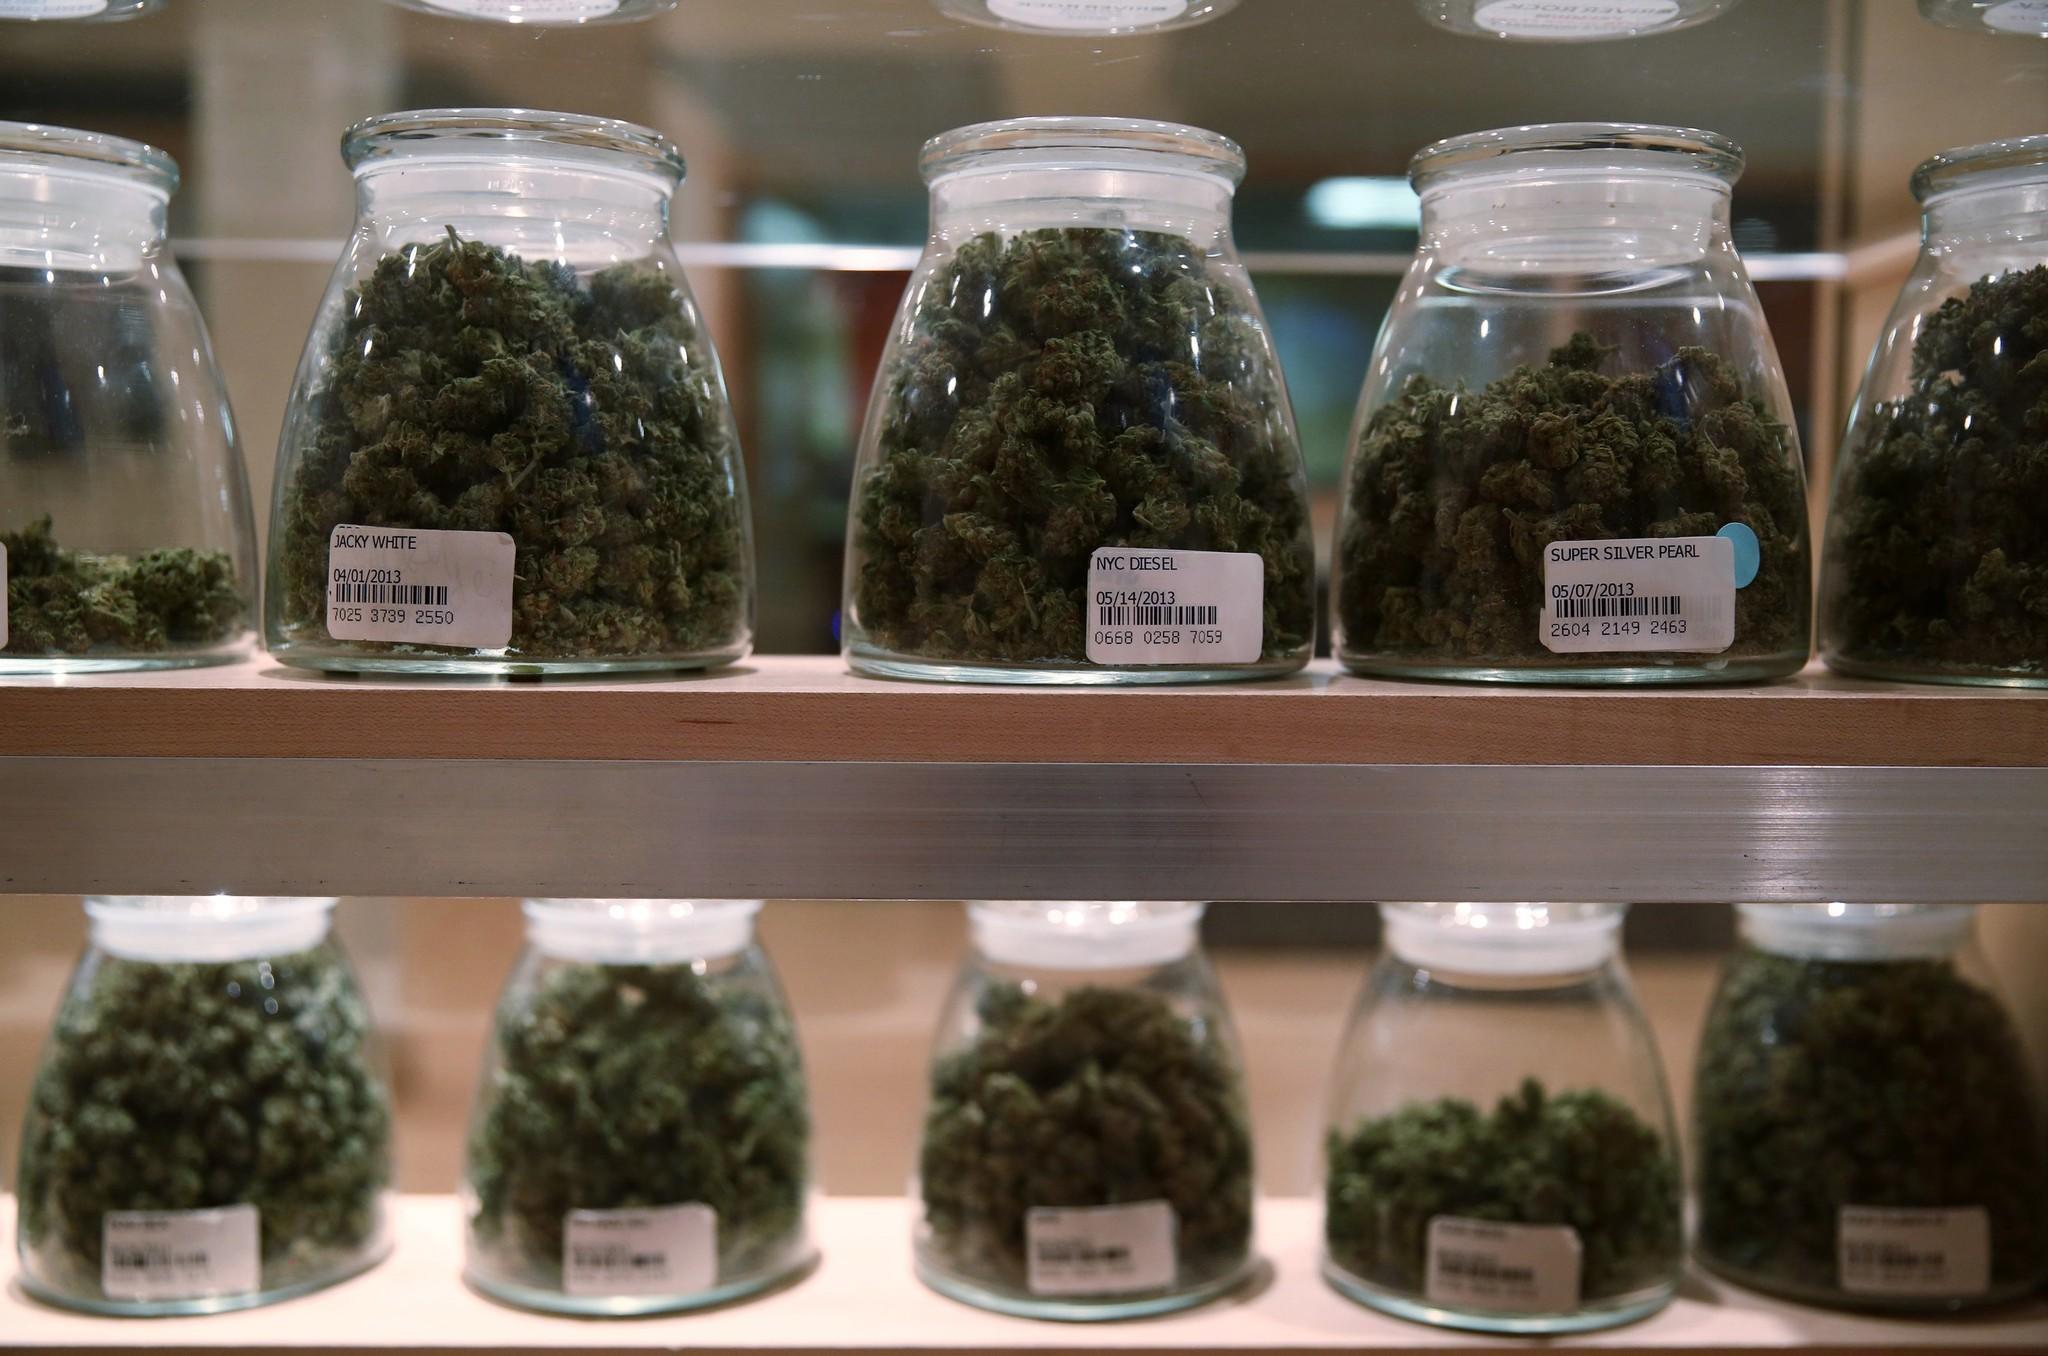 Jars containing various strands of medical marijuana sit behind a display case at the River Rock Medical Marijuana Center in Denver, Colorado, on May 16, 2013.